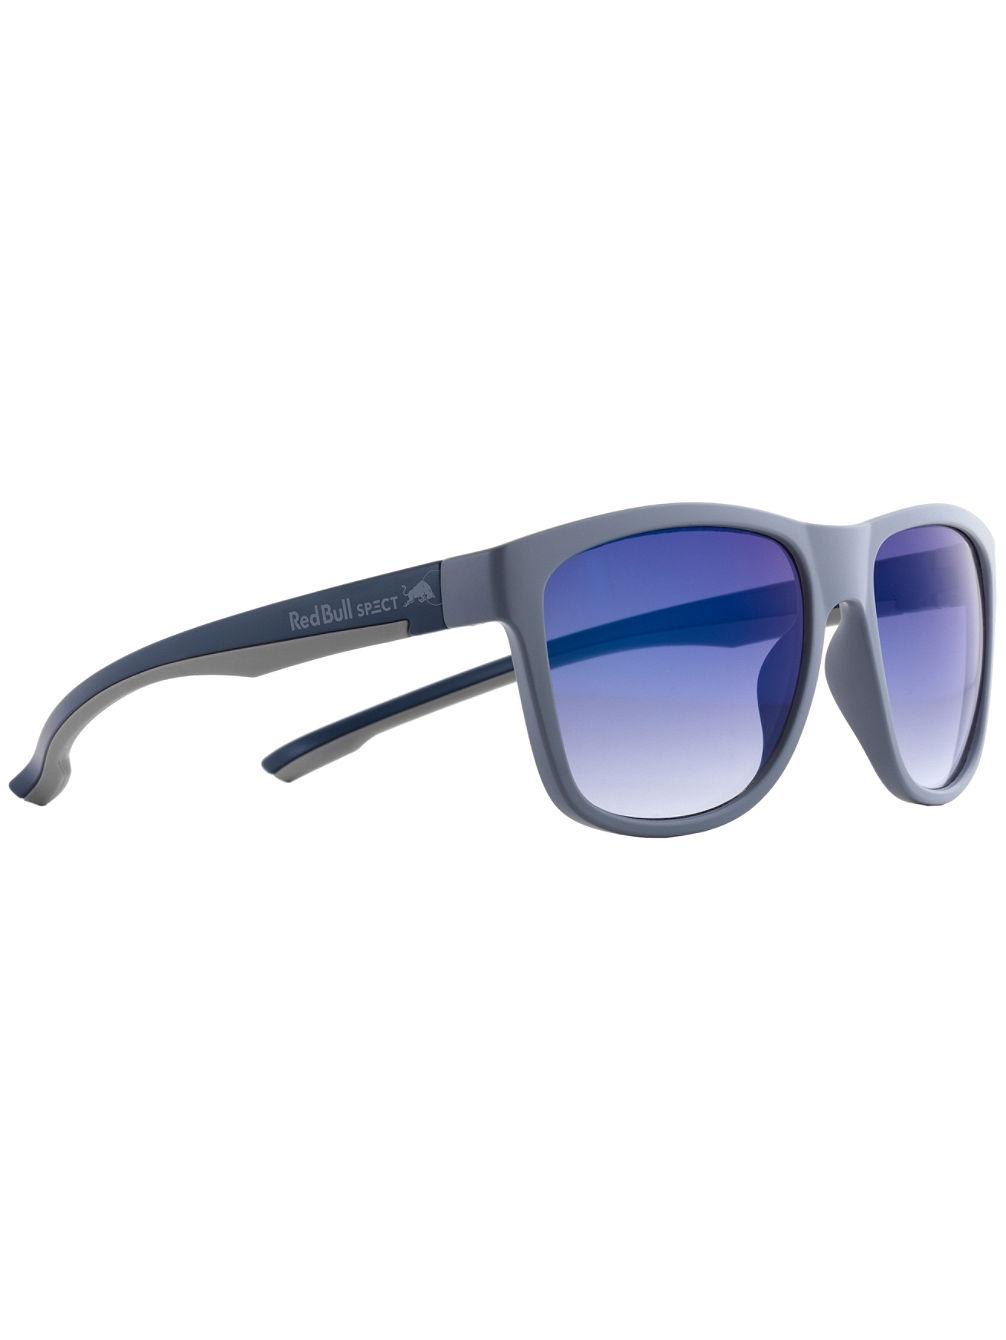 8b061482fc66 Buy Red Bull SPECT Eyewear Bubble Matte Grey/Grey online at blue ...